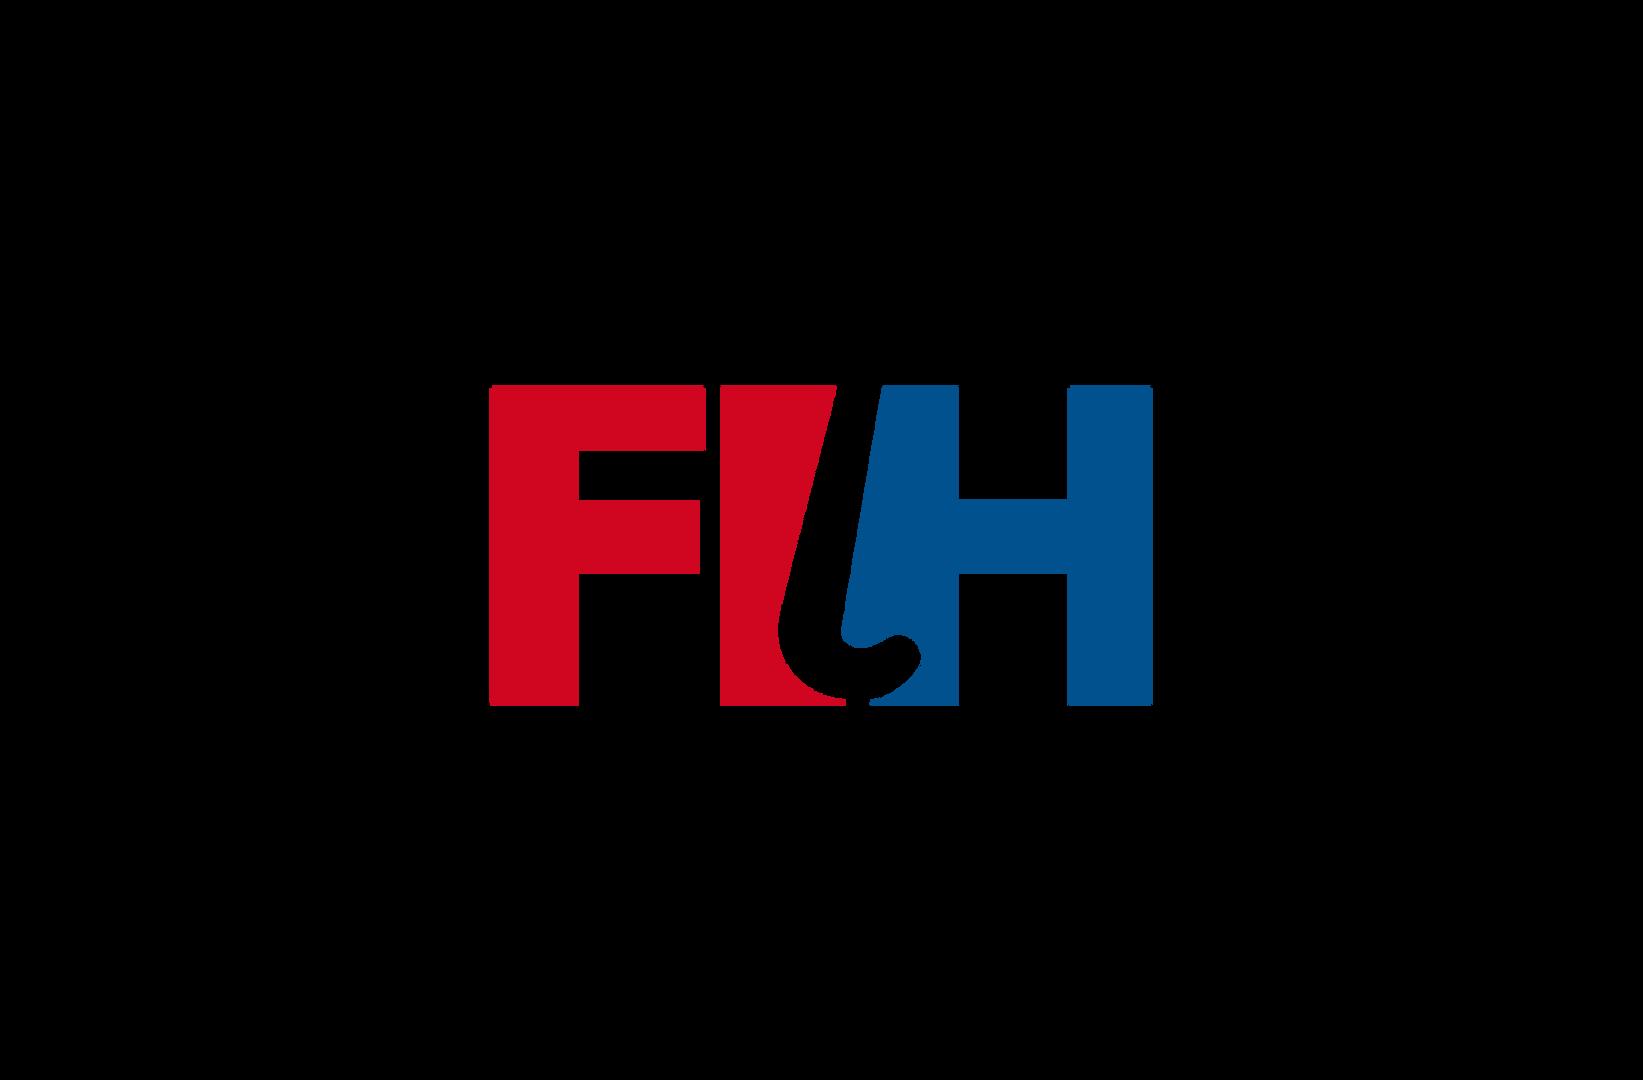 LOGO-FIH.png